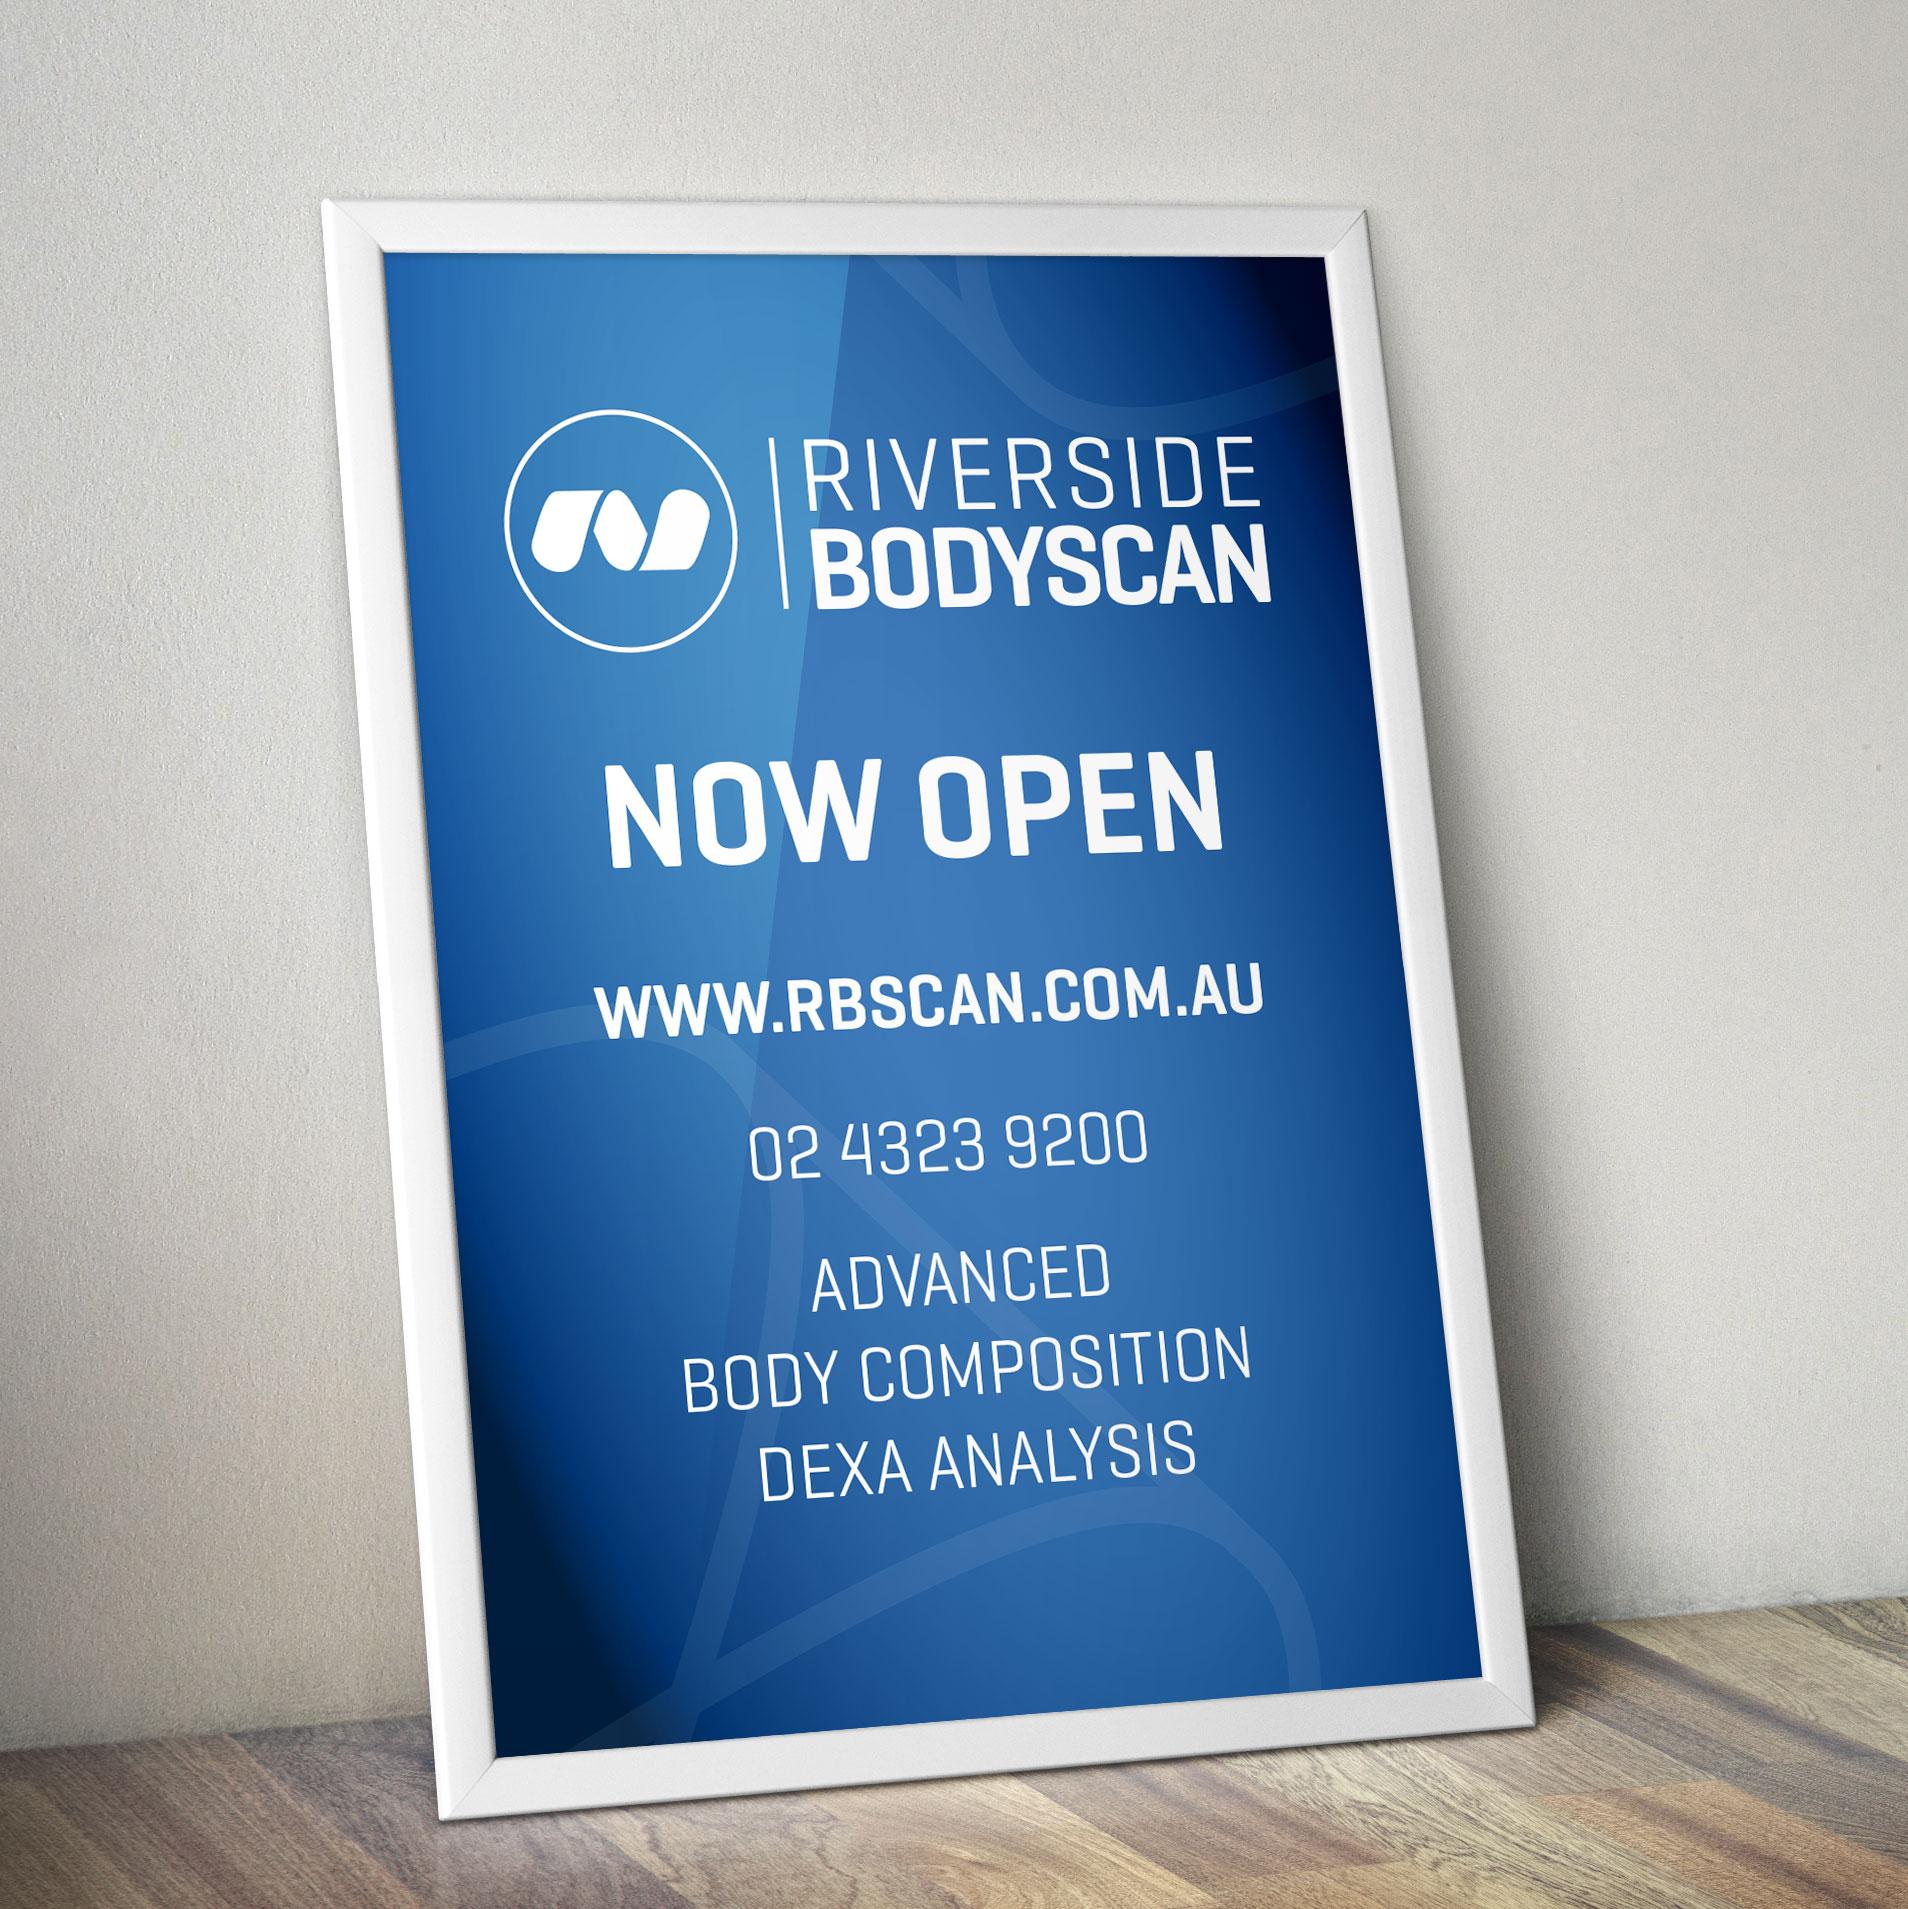 Riverside BodyScan in West Gosford is now officially open!